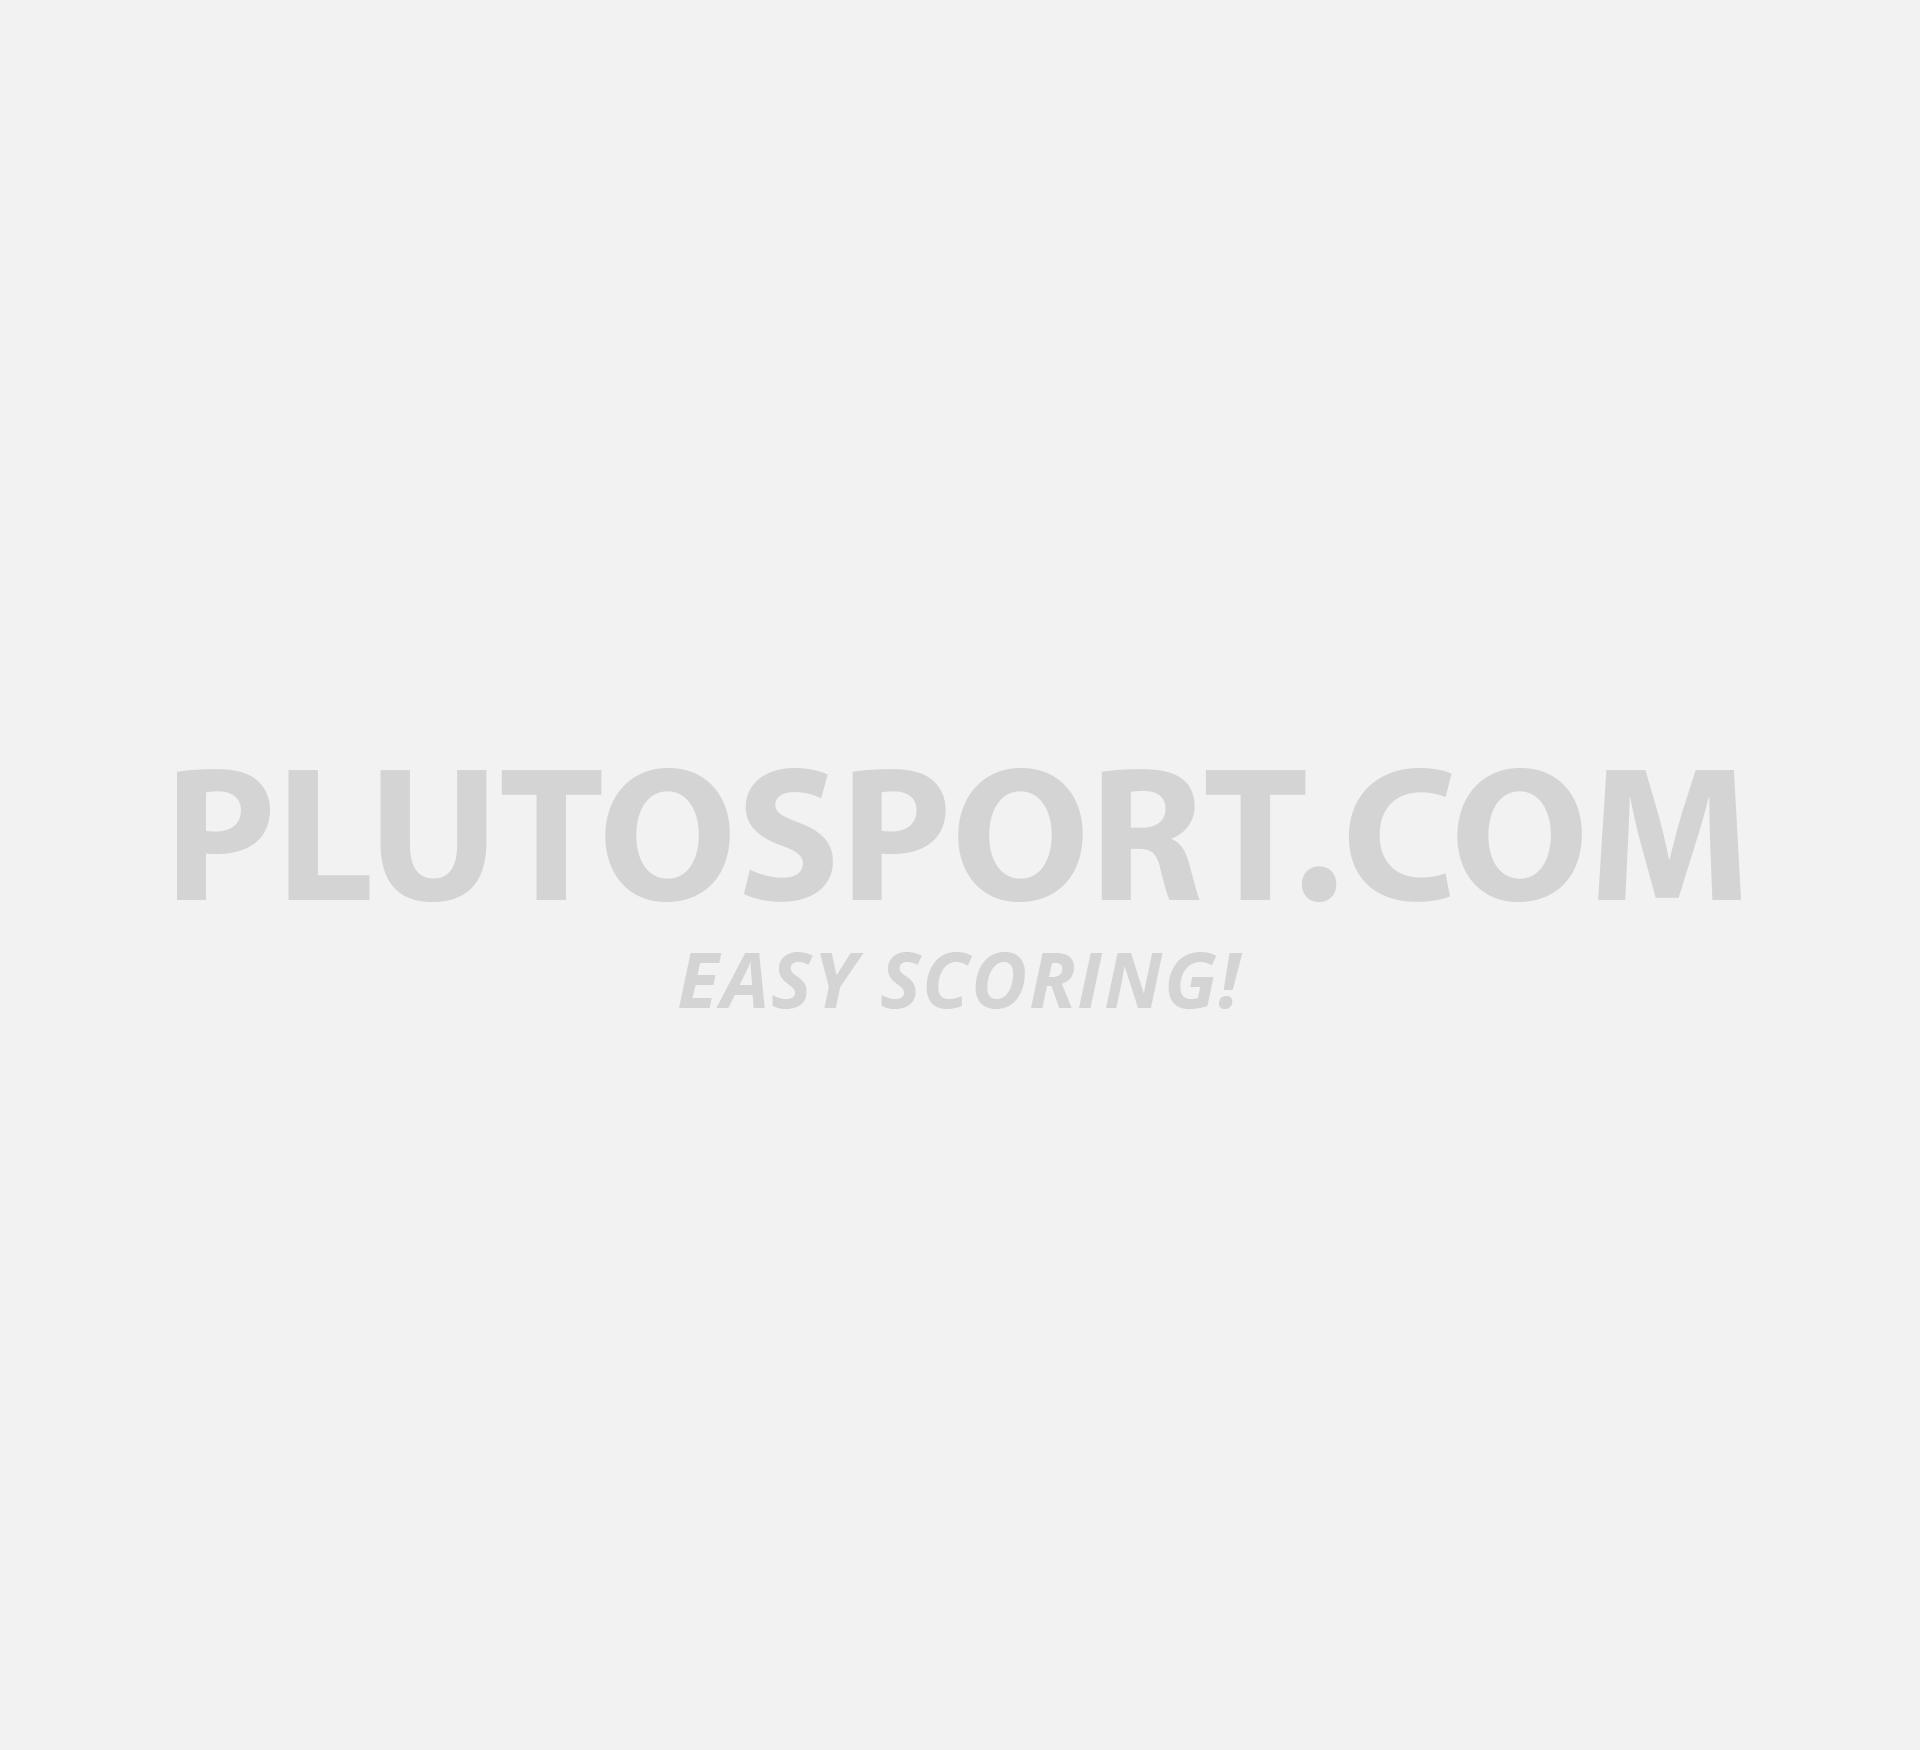 official photos 74048 60ac0 Nike Free Run 2 (GS) Running Shoes Junior - Neutral - Shoes - Running -  Sports  Plutosport